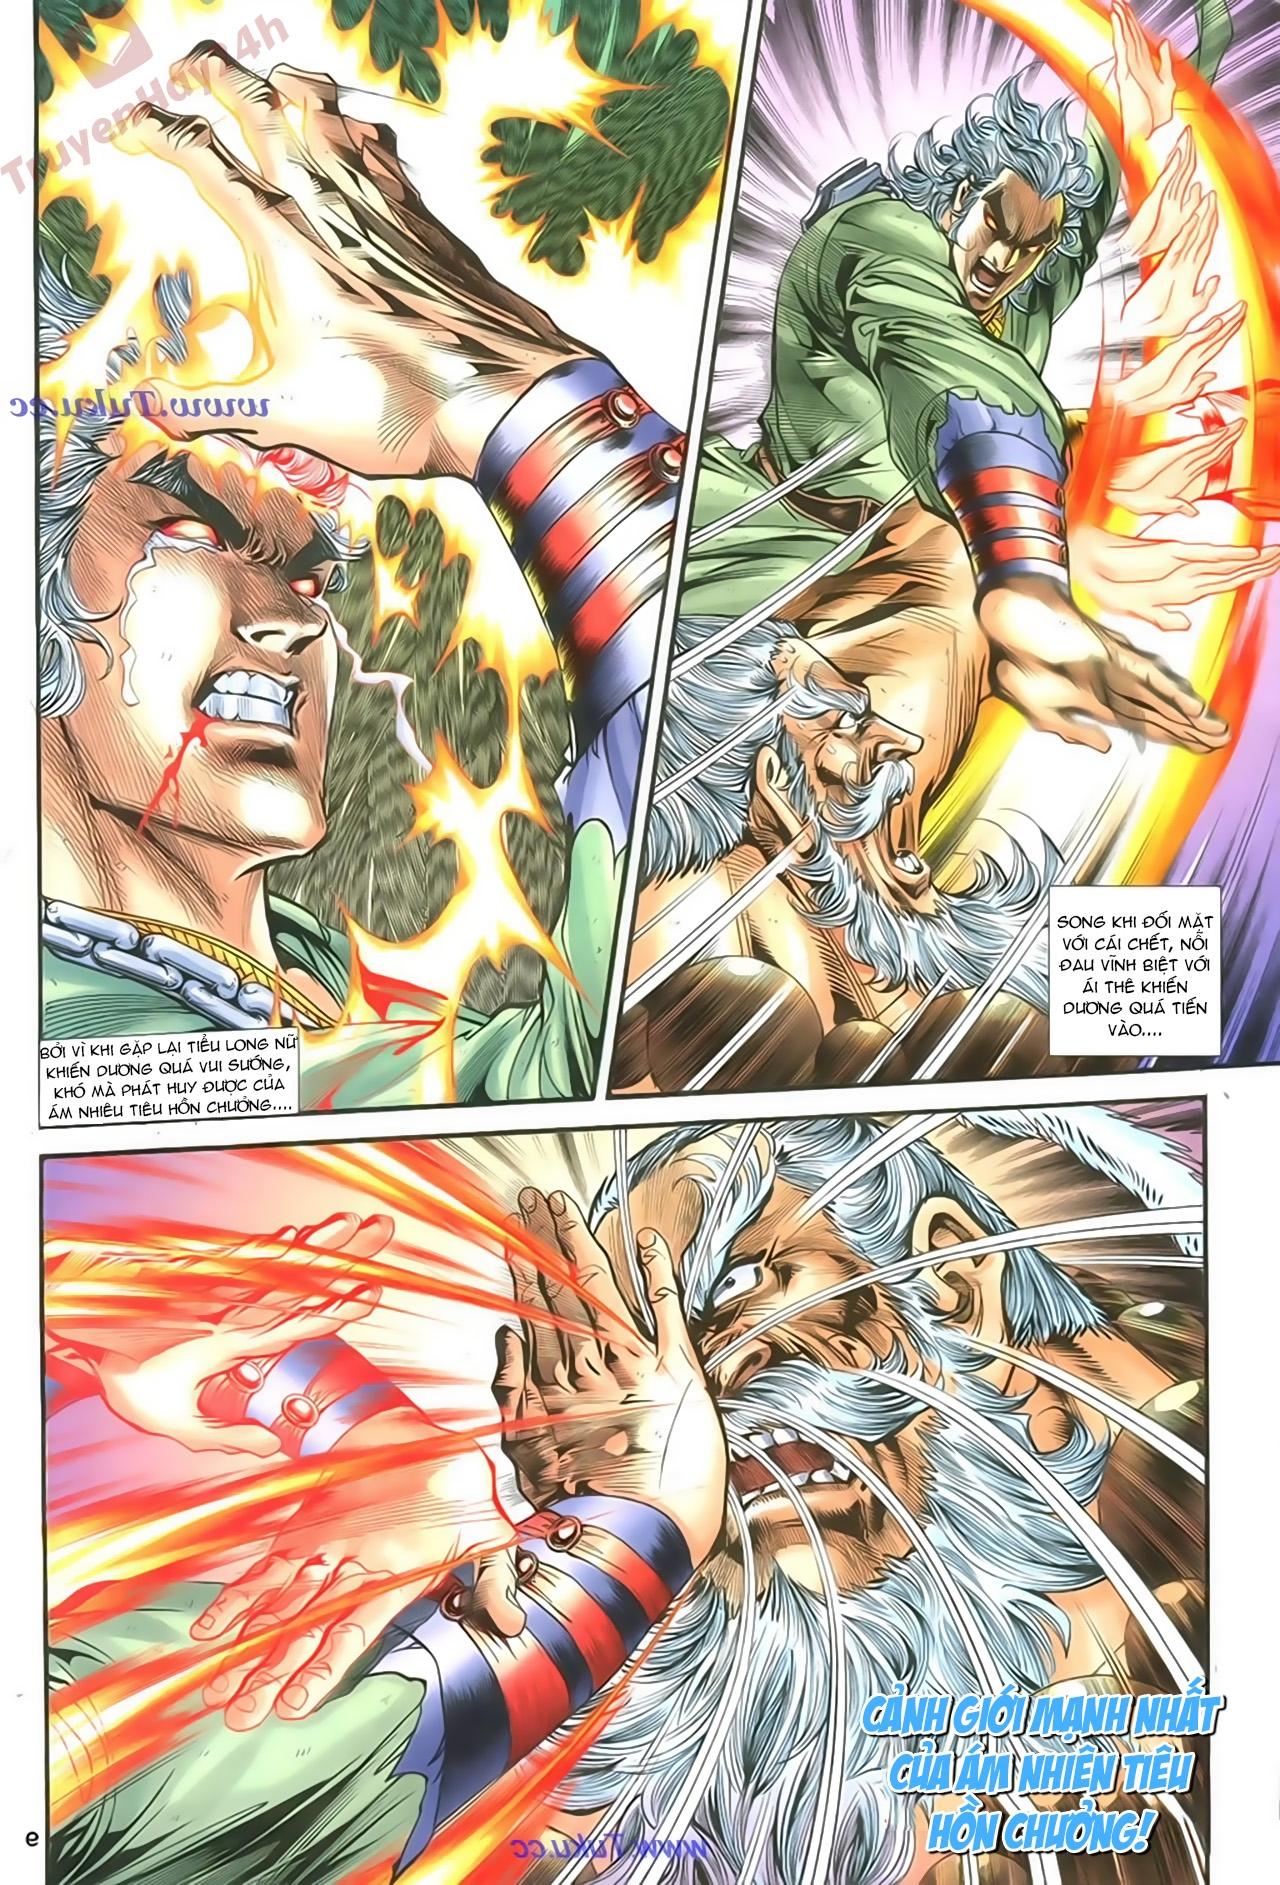 Thần Điêu Hiệp Lữ chap 86 – End Trang 9 - Mangak.info